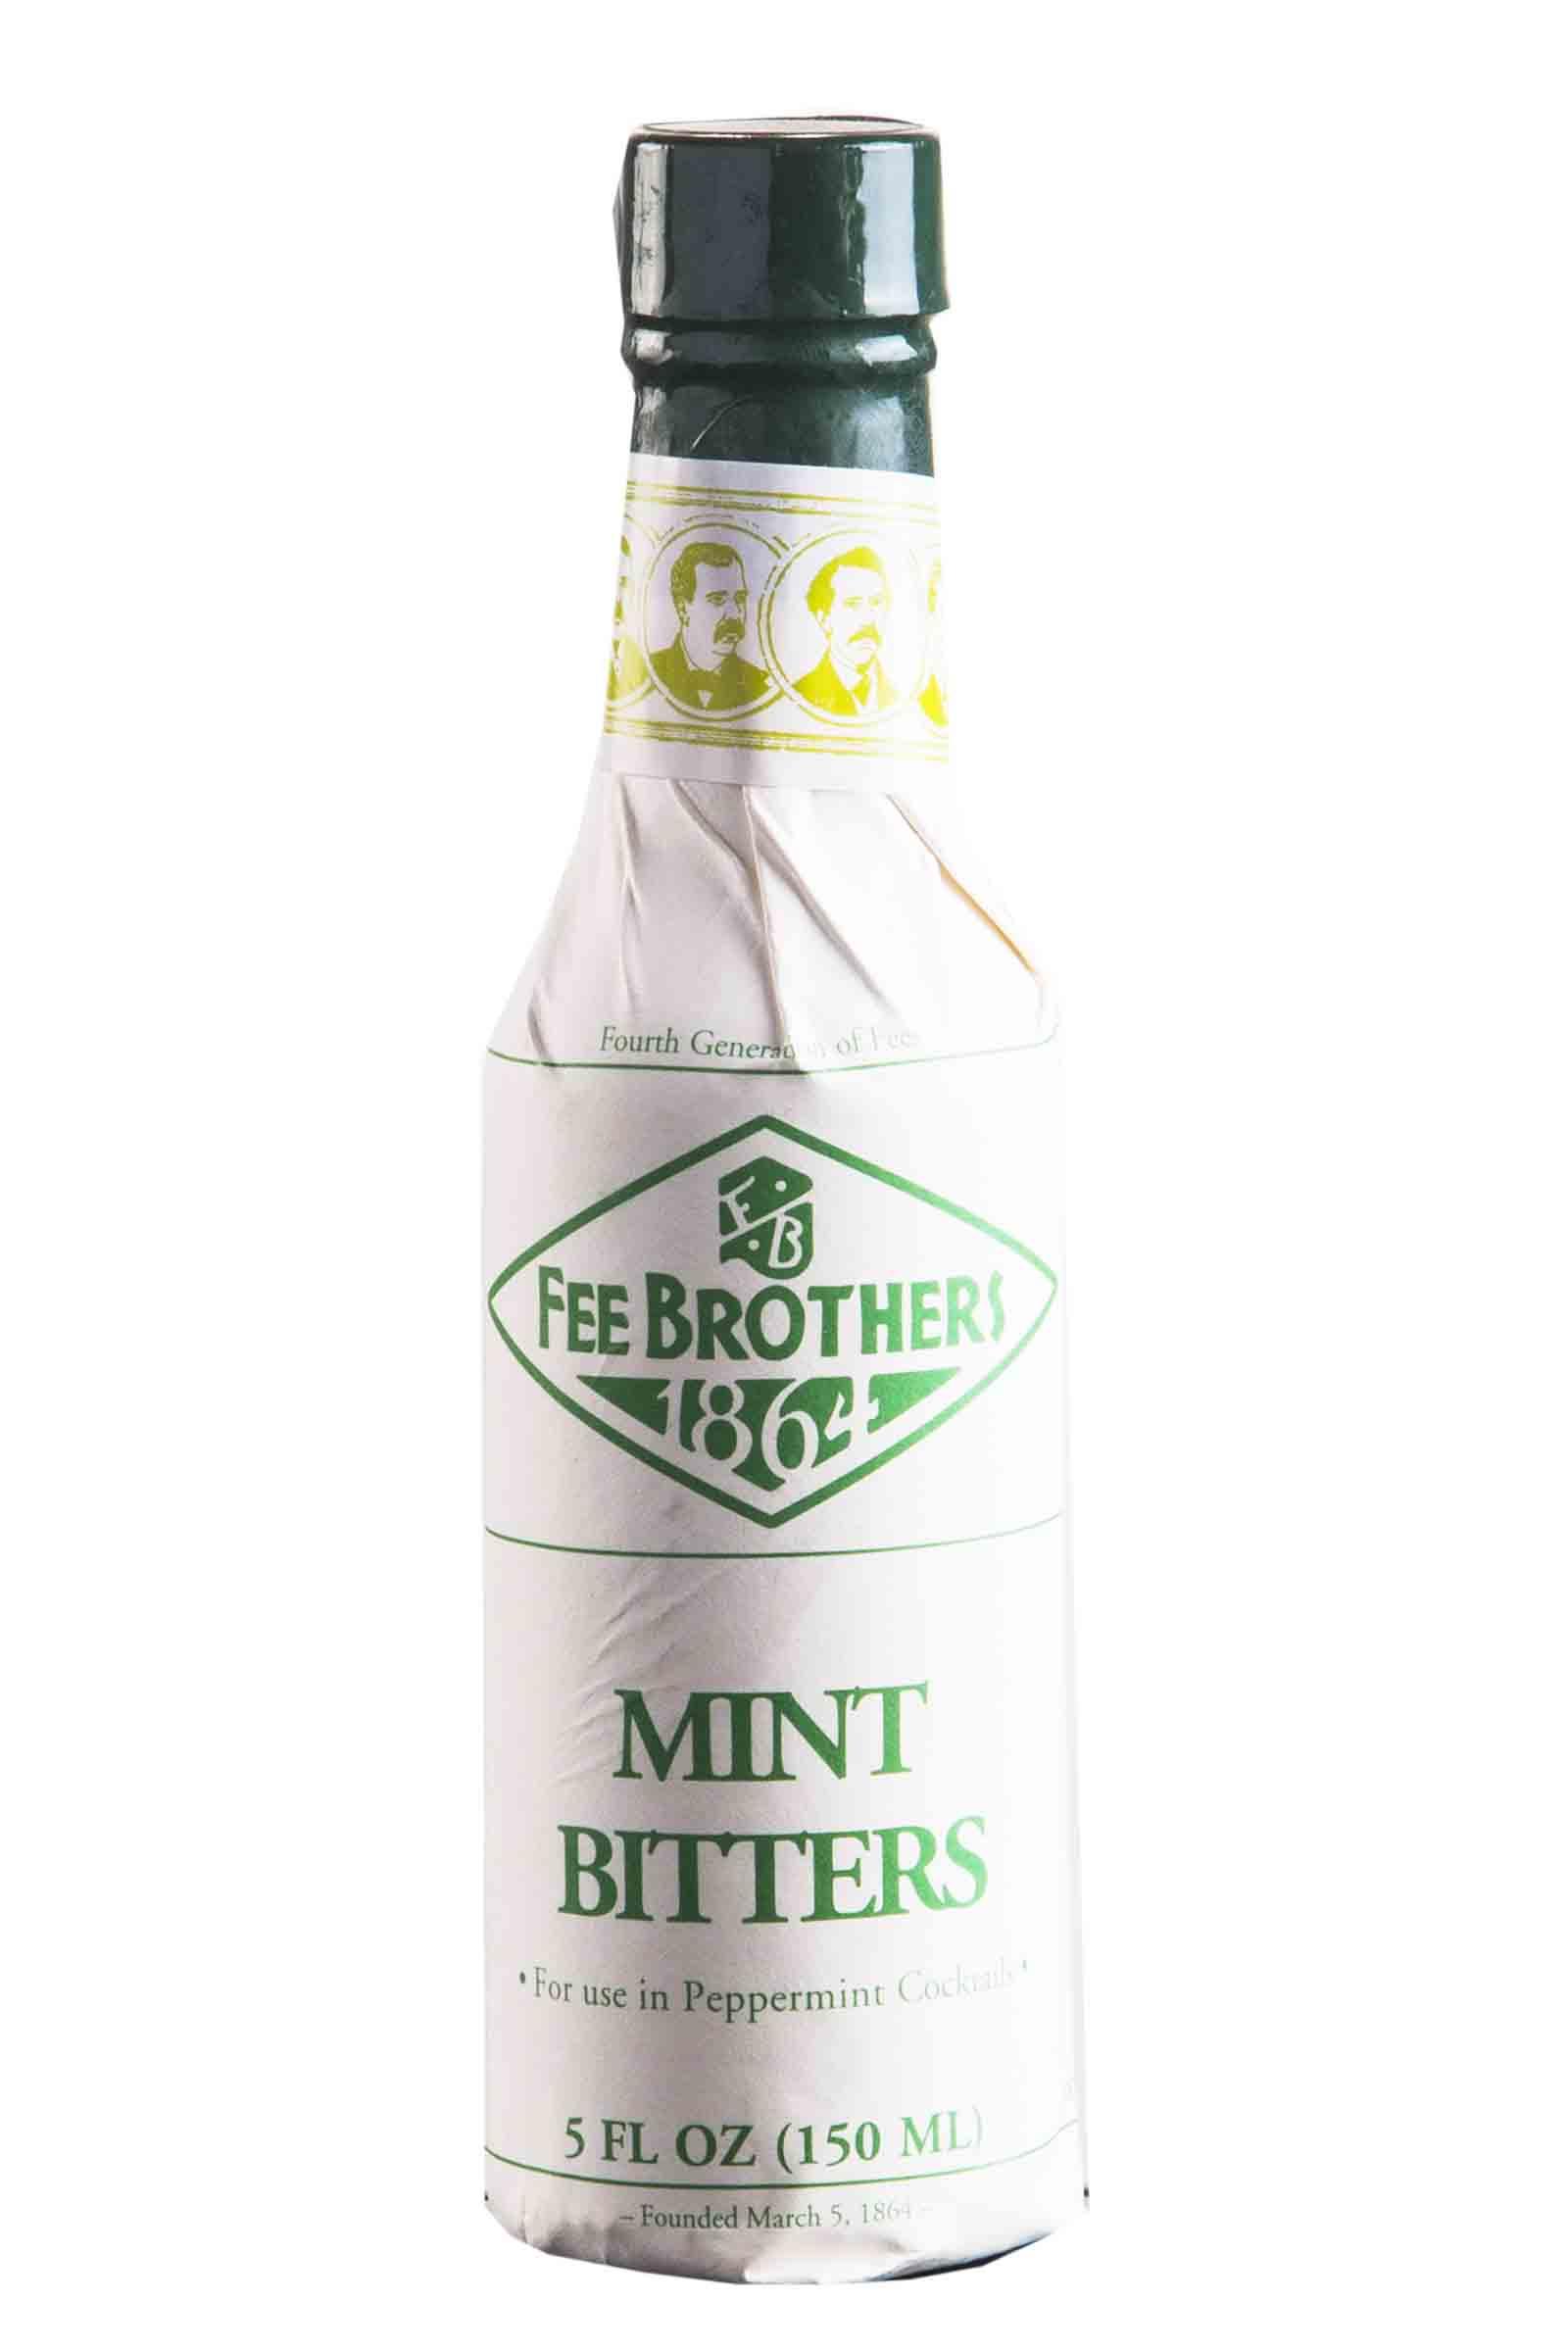 Fee Brothers Mint Bitters 147.8ml